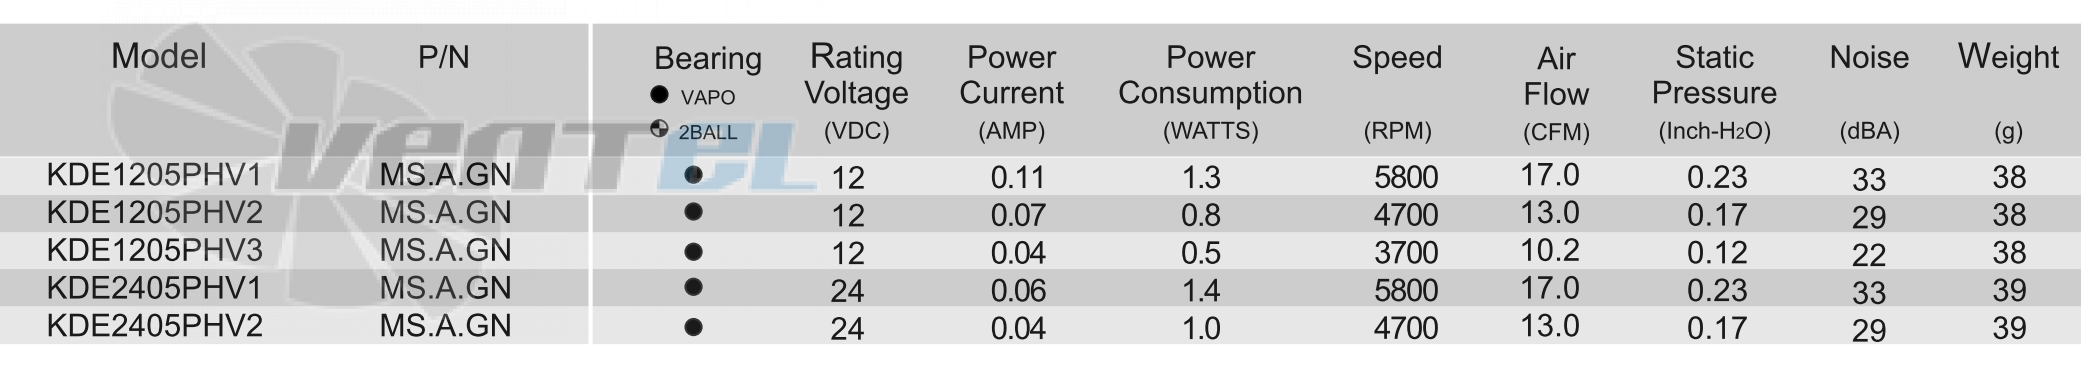 Технические характеристики Sunon KDE2405PHV1